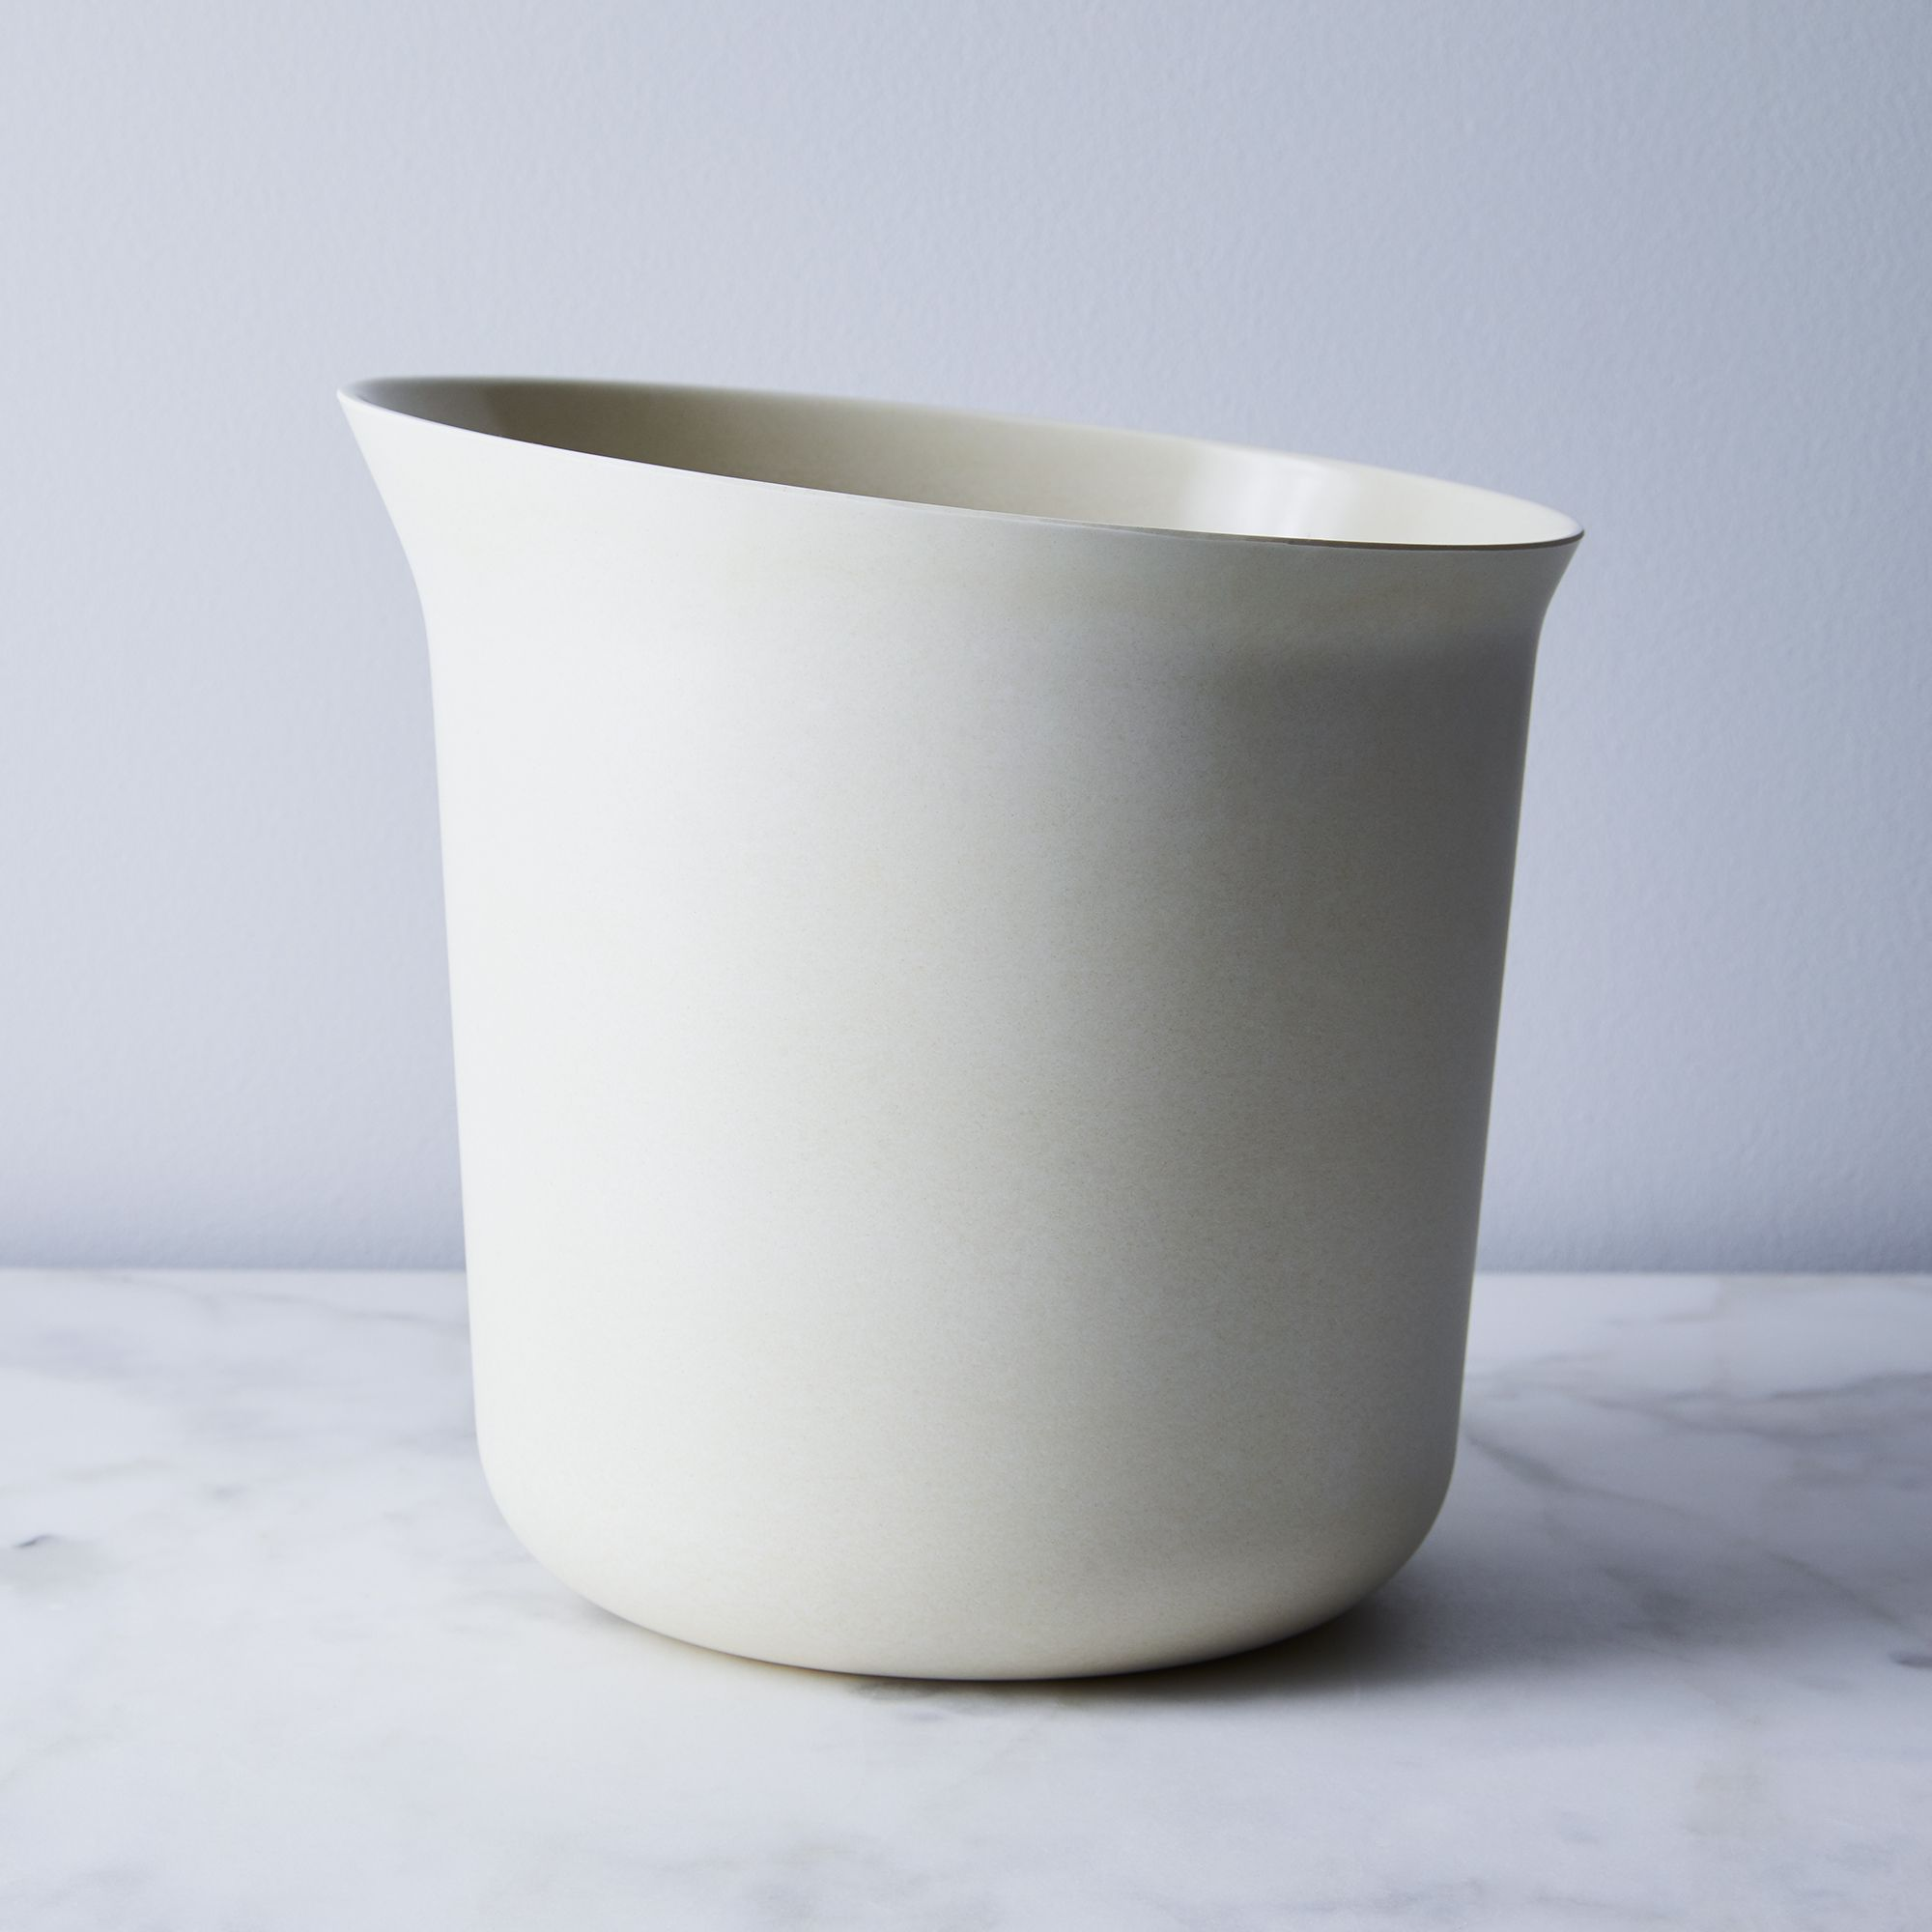 B1e1a22b c501 40eb b5fa 3294a3c8e4c6  2018 0201 ekobo recycled bamboo wine bucket white silo ty mecham 005